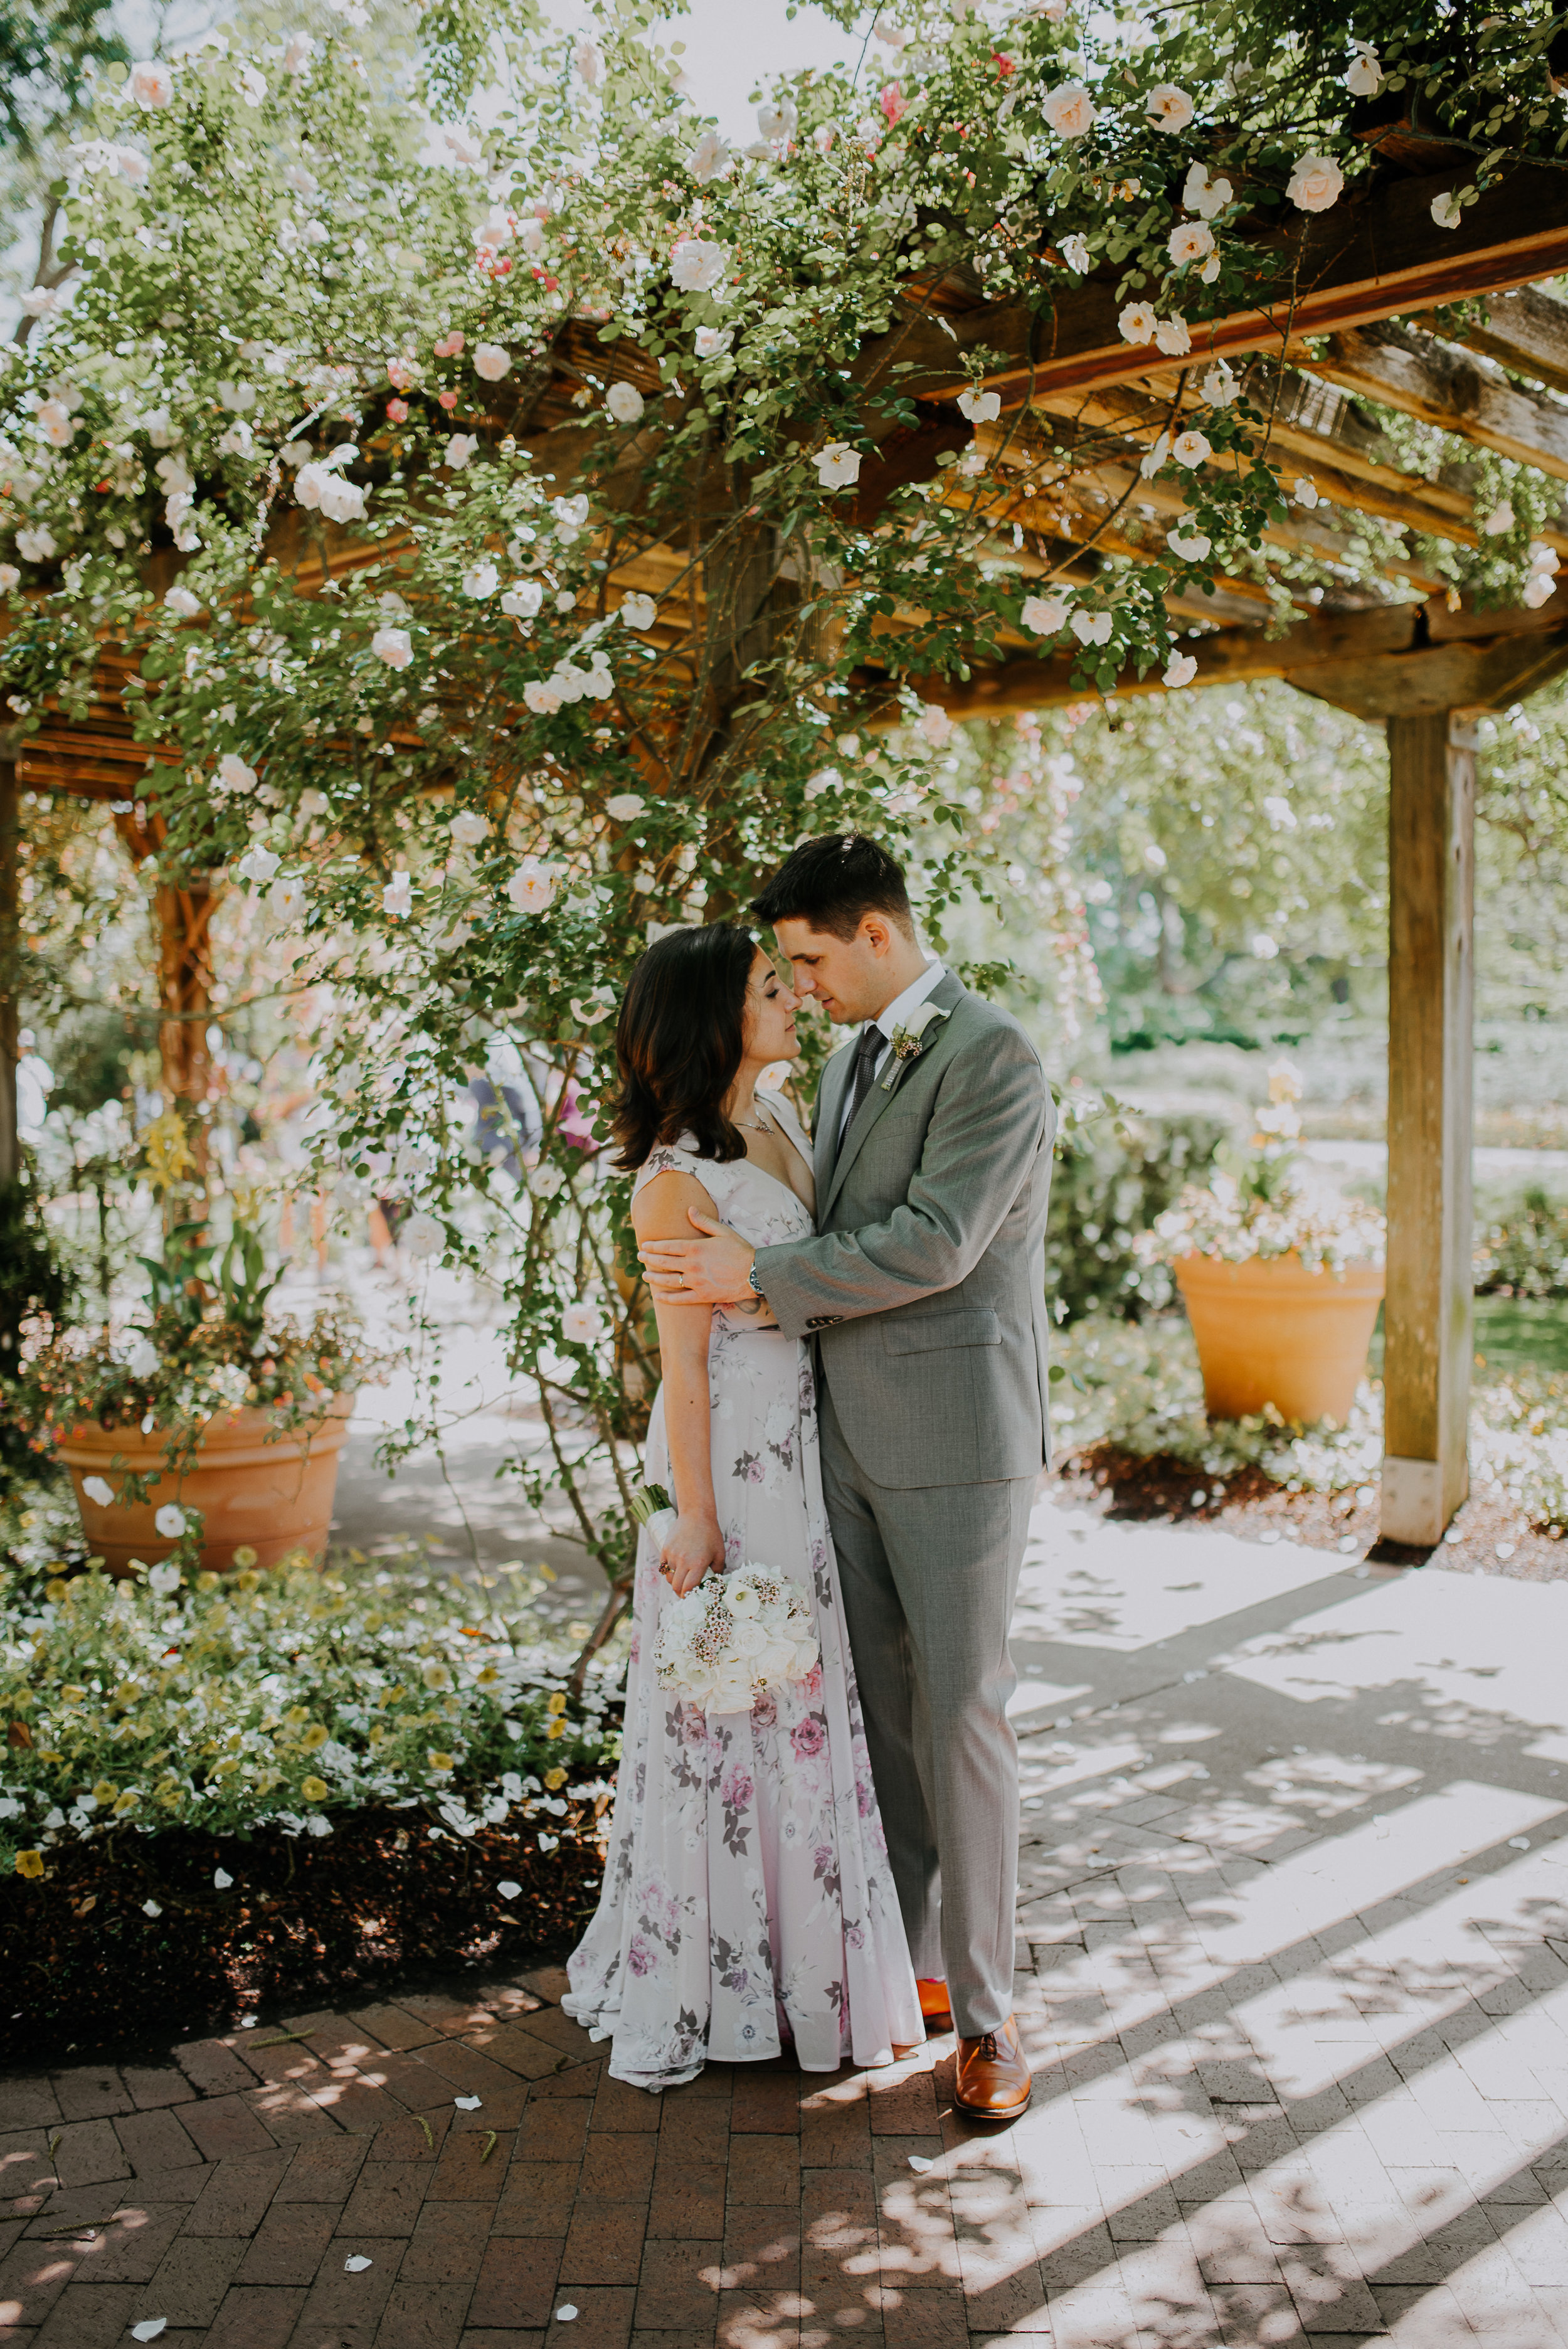 Dallas-fort-worth-wedding-photographer-dallas-arboretum-intimate-wedding-dallas-texas-19